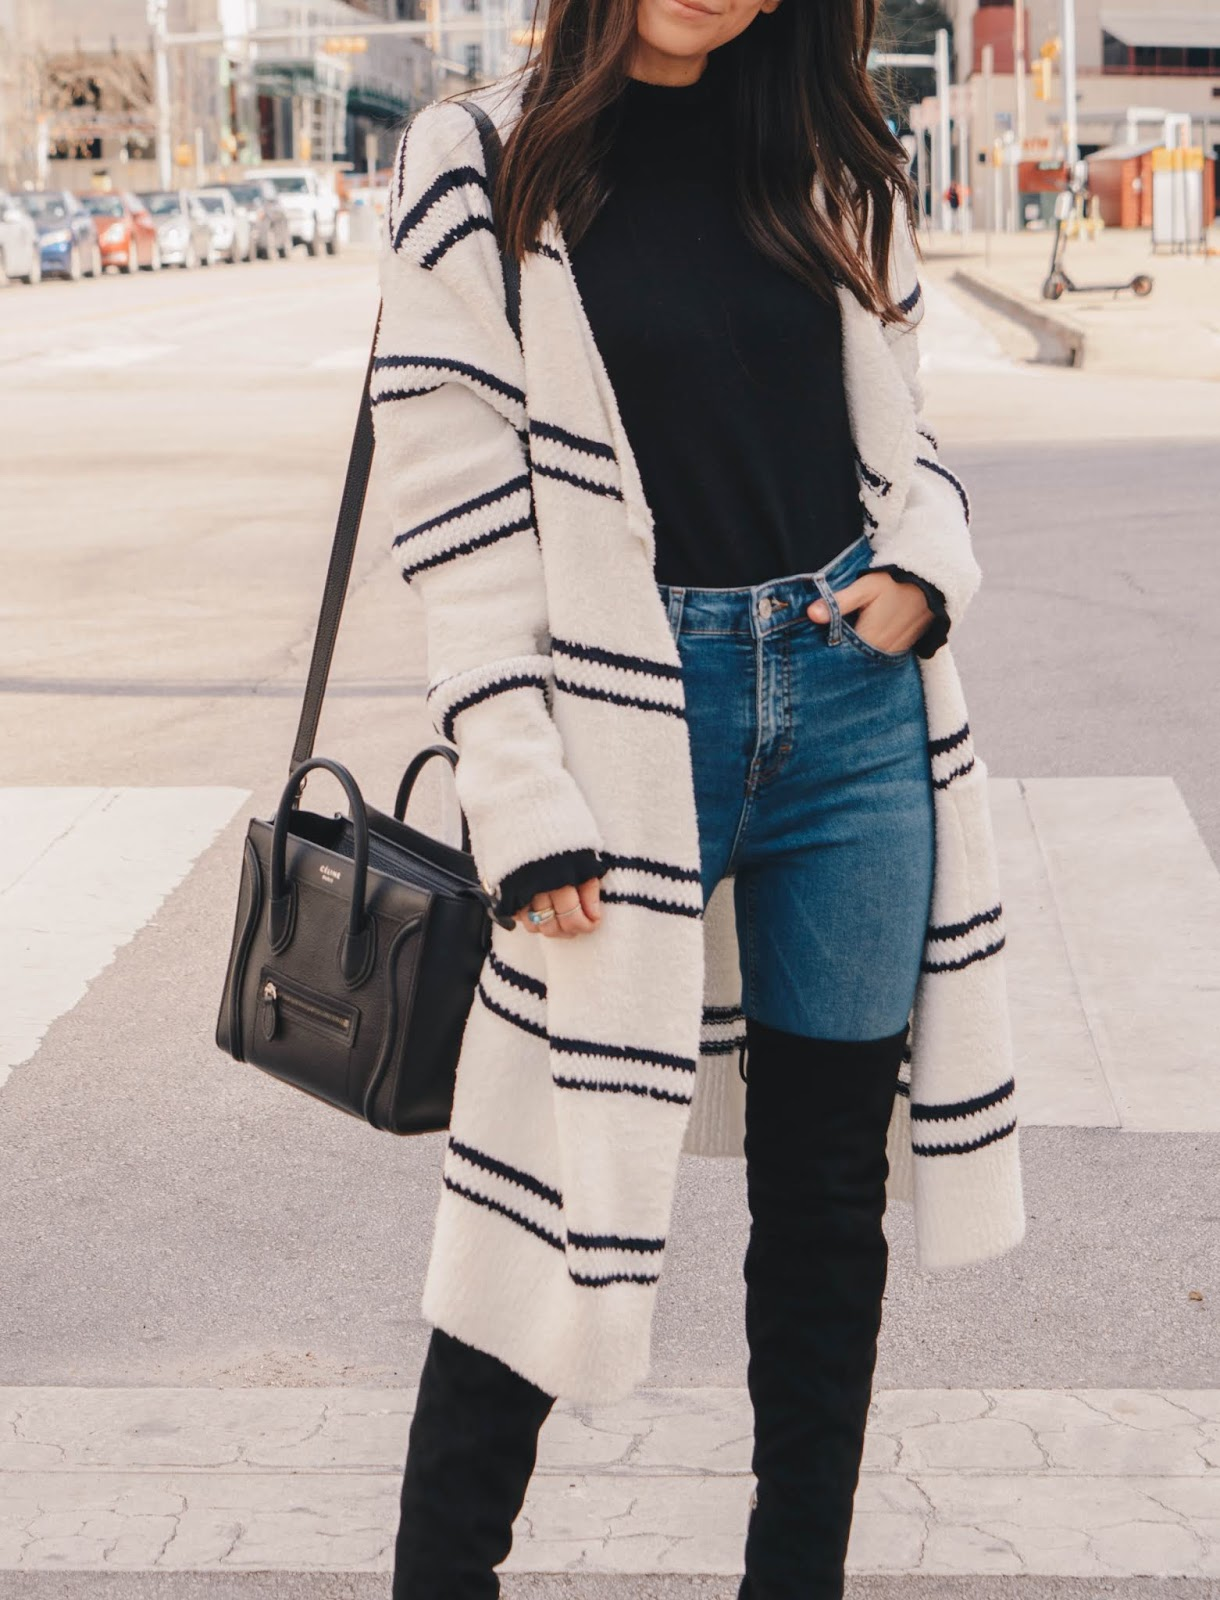 Cozy cardigan for winter